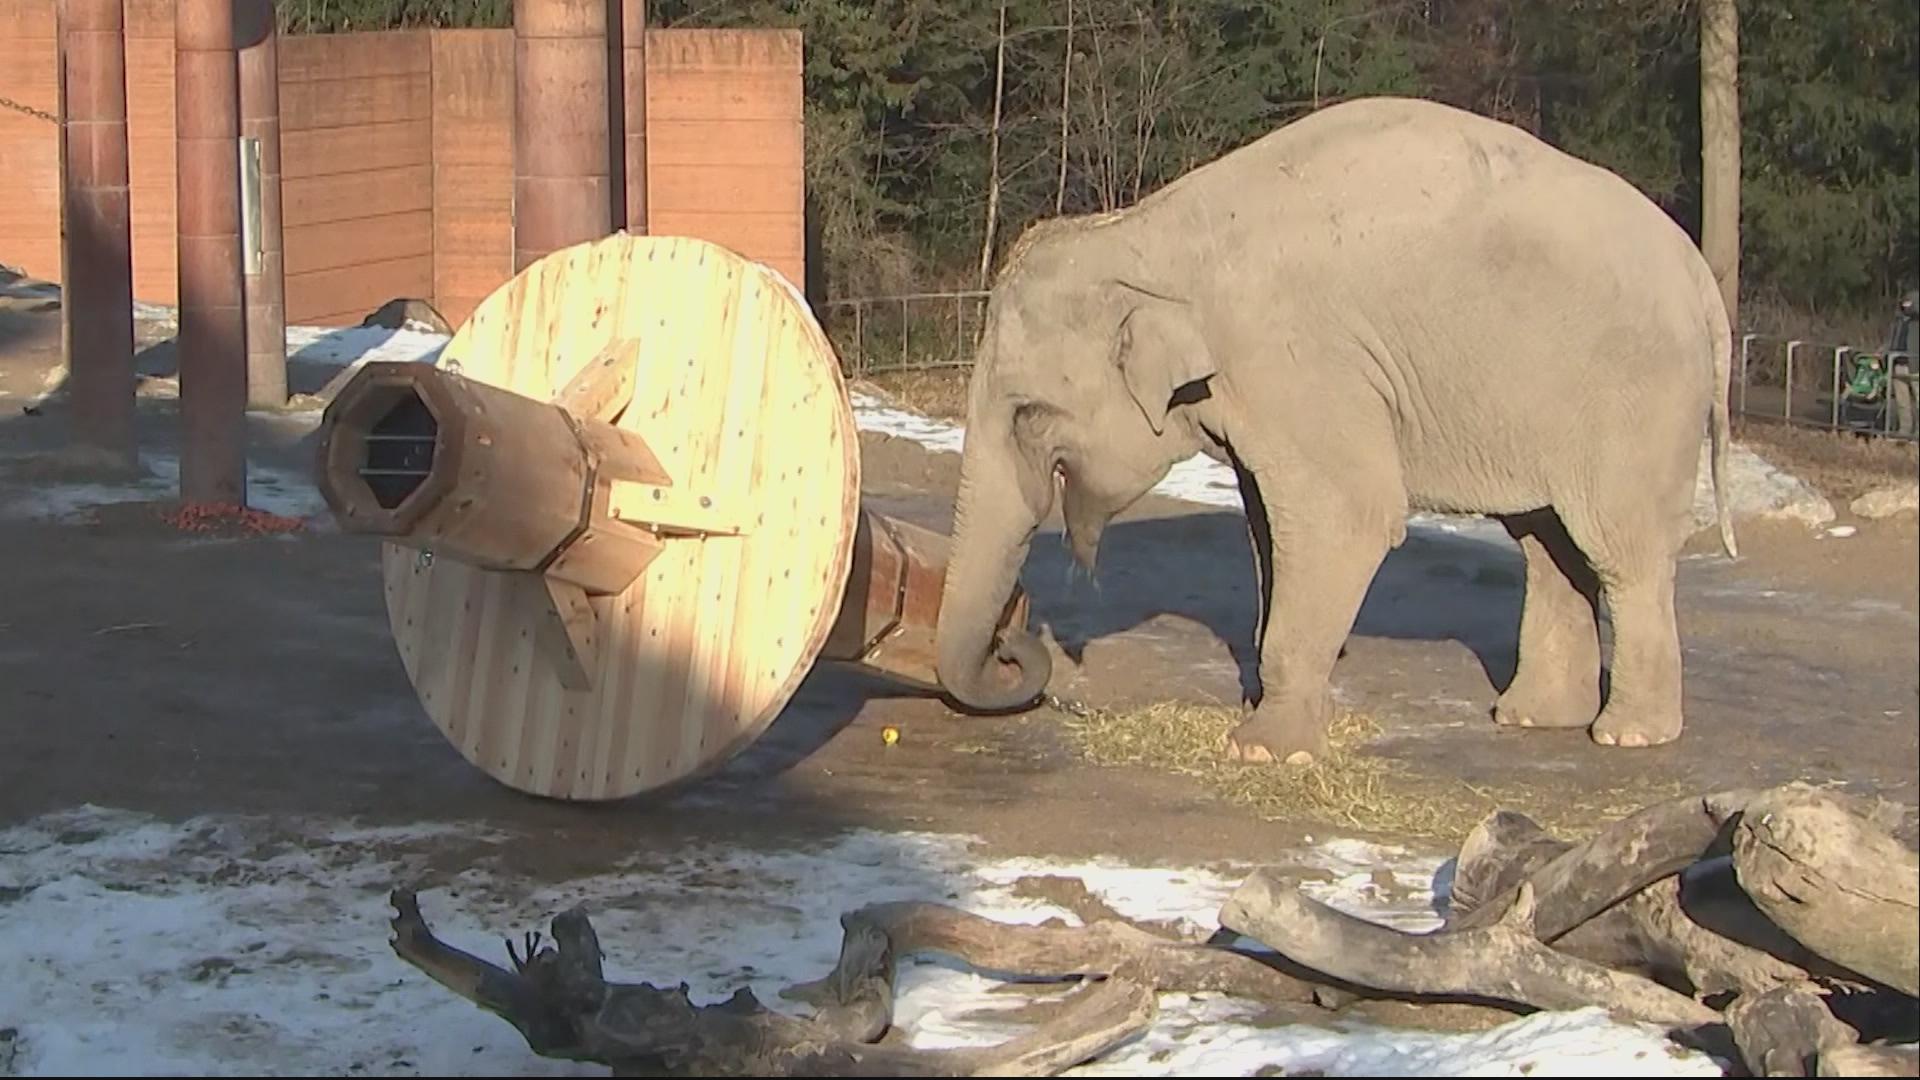 elefanter_zoo_kaempe_feeder_billede_drdkrjpo_00000011.jpeg